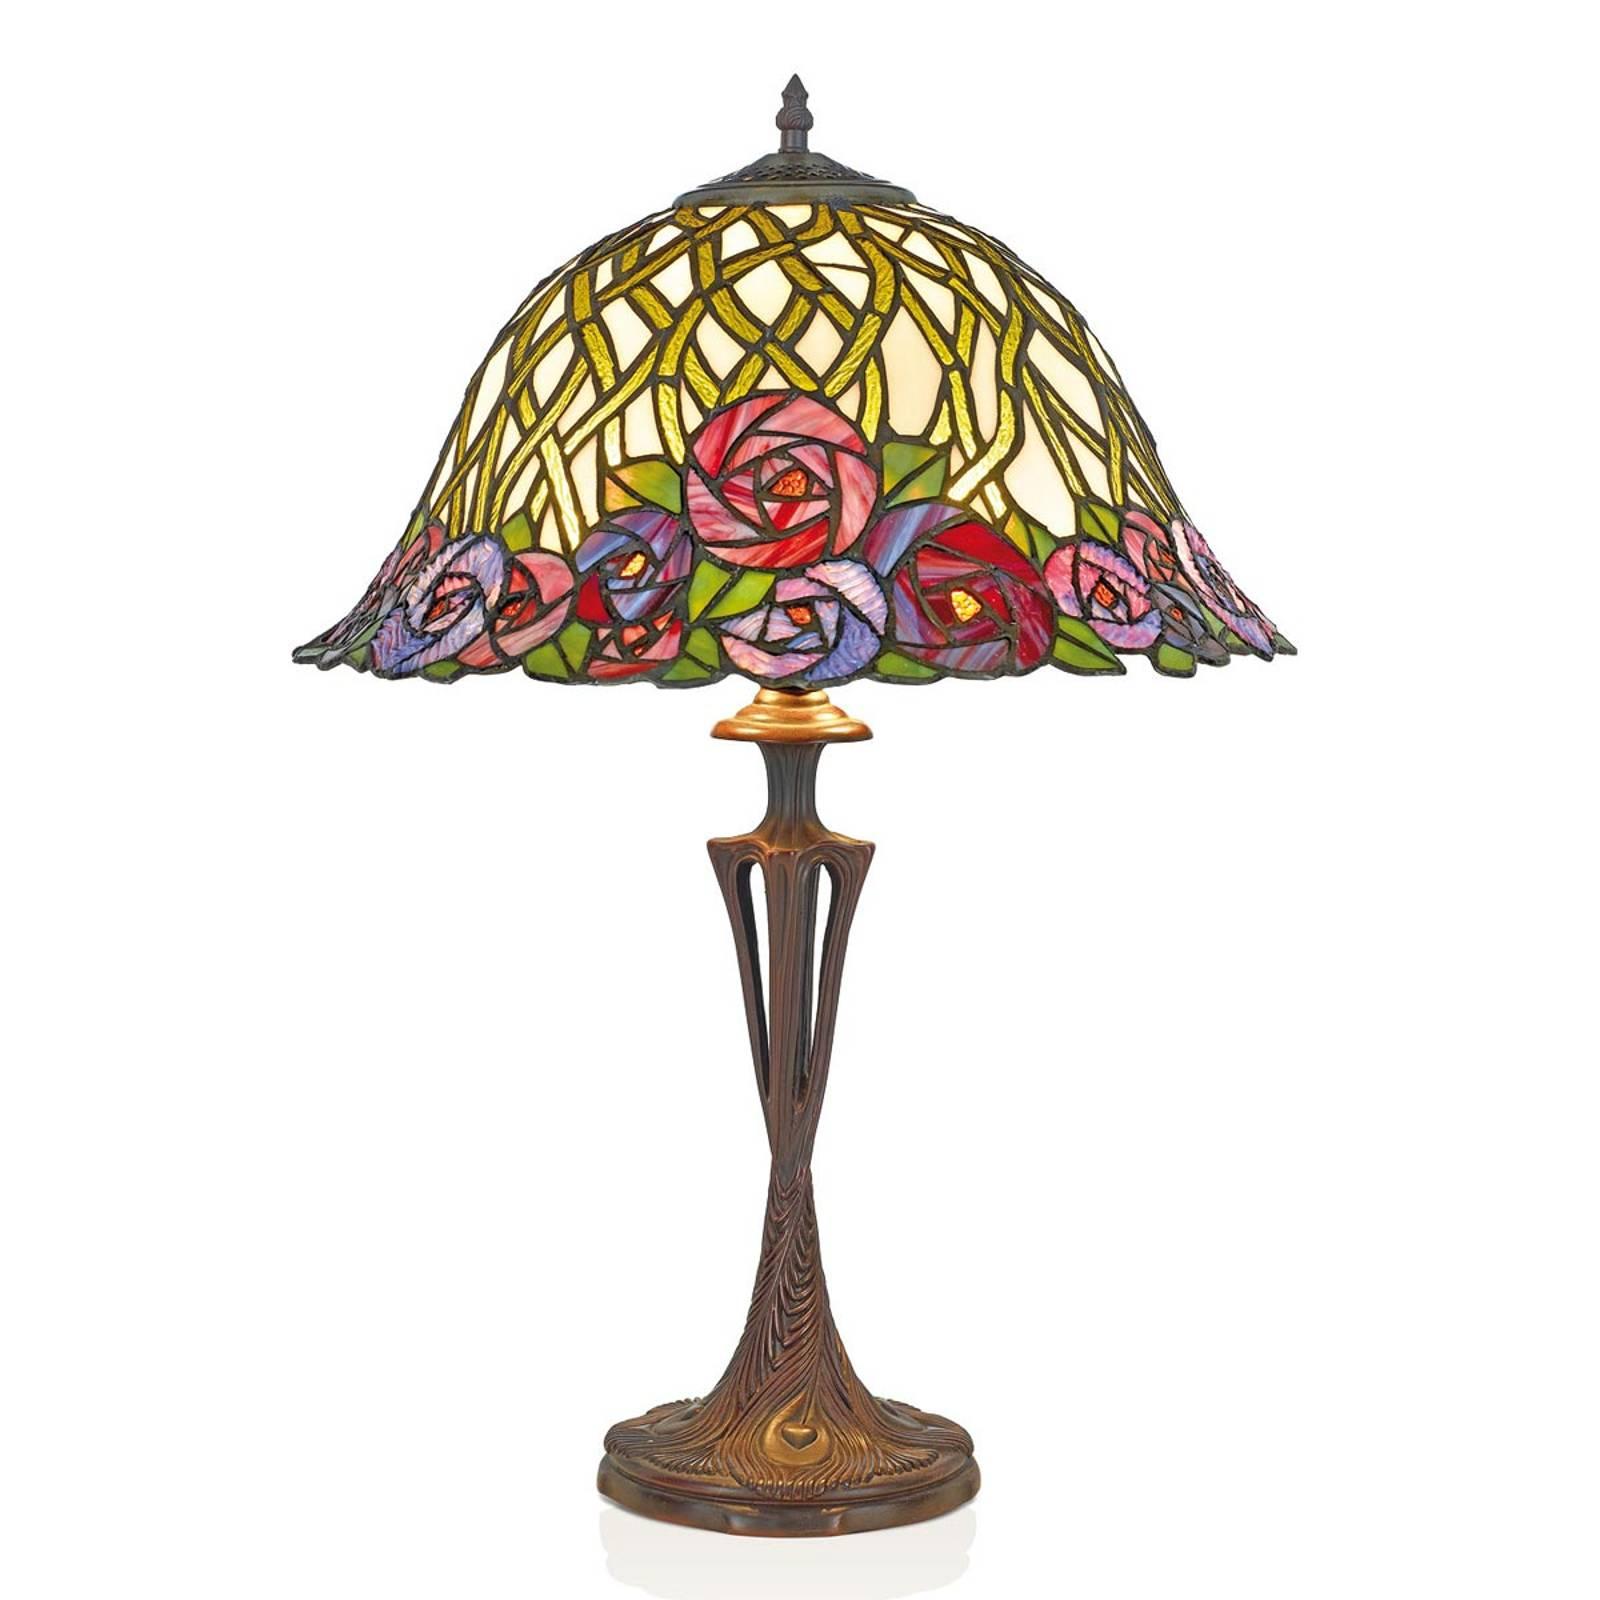 Lampe à poser Melika de style Tiffany